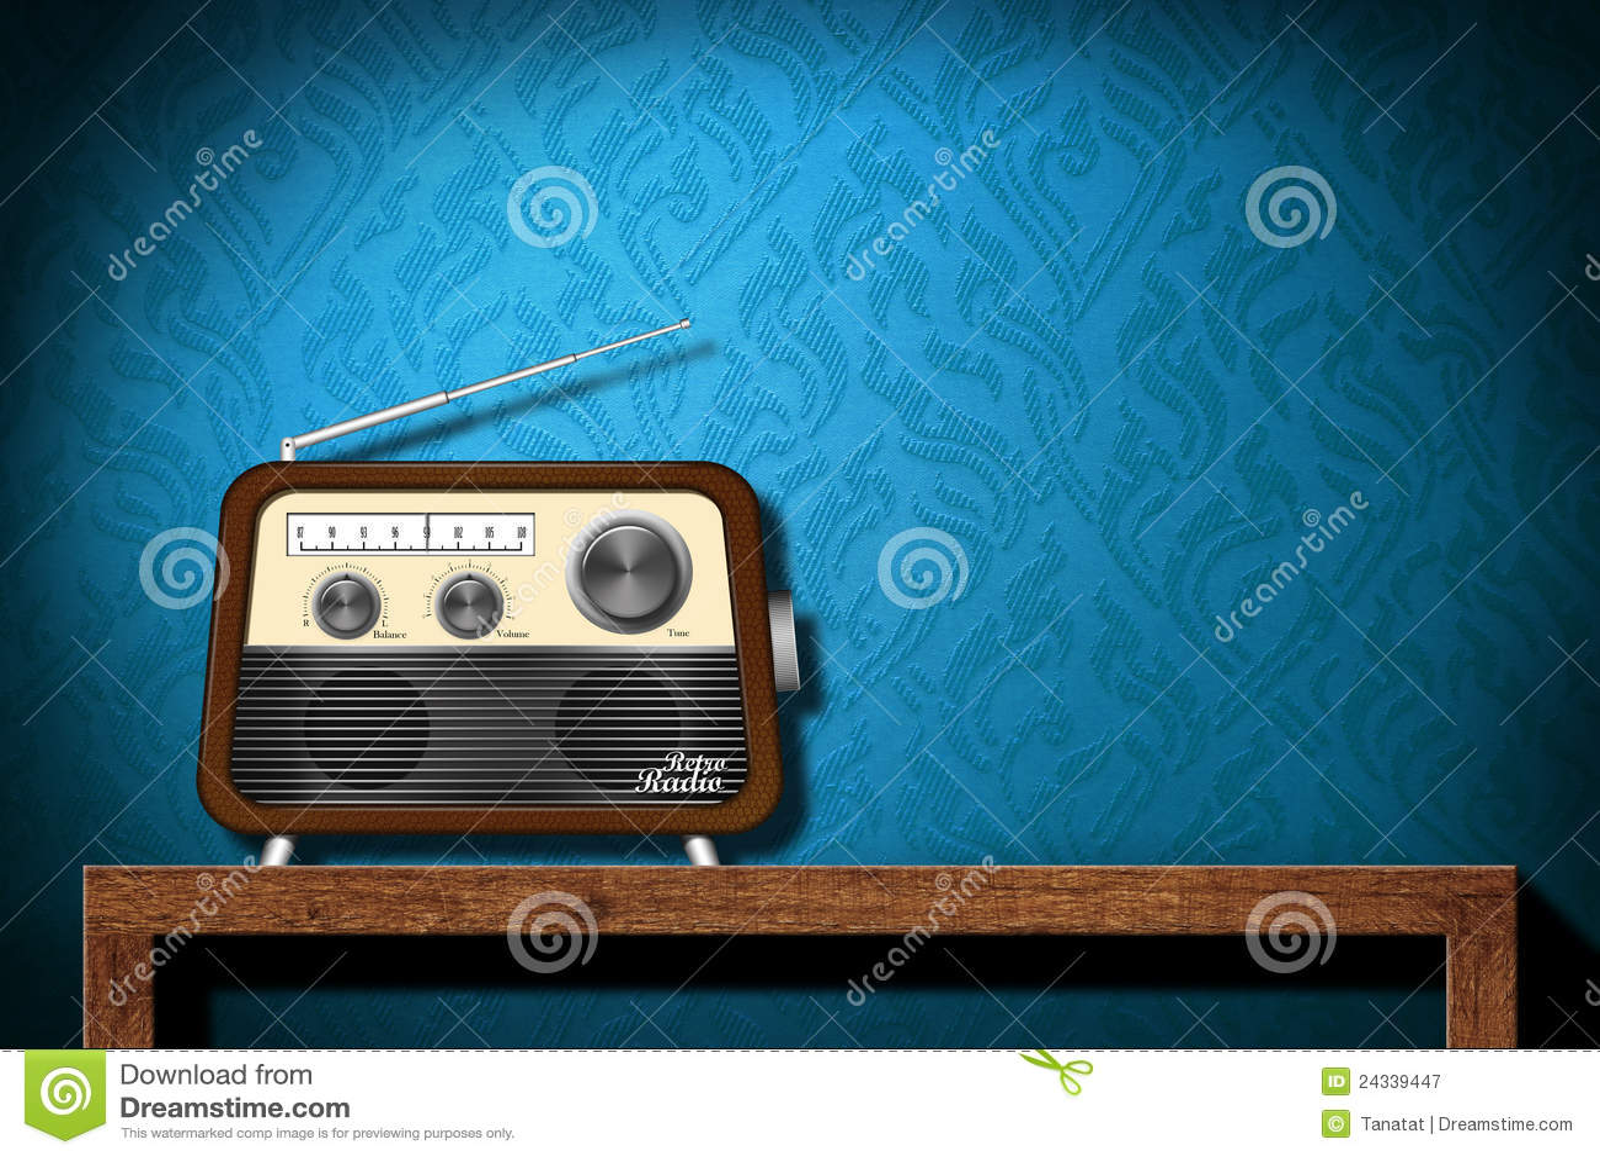 Vintage Radio Wallpaper Retro radio on wood table with